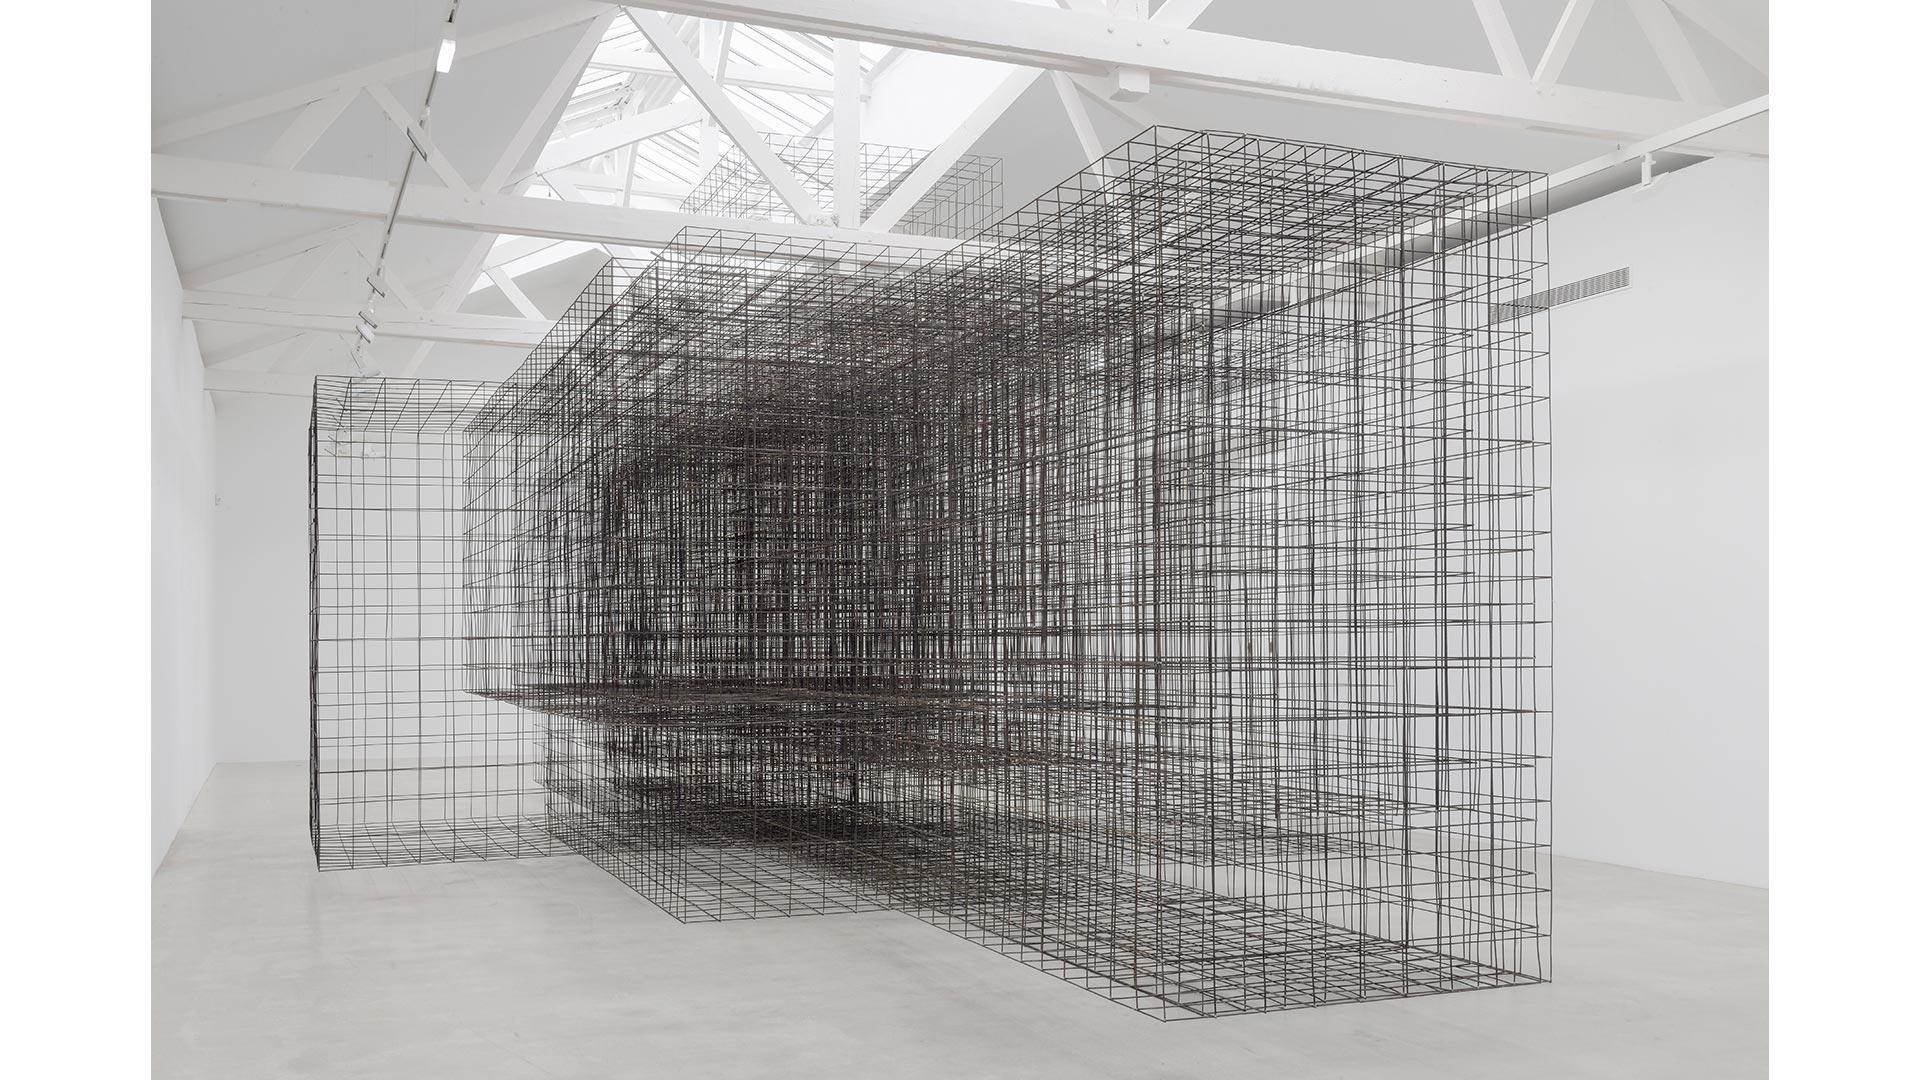 Antony Gormley, Matrix II, 2014. 6 mm mild steel reinforcing mesh, 550 x 750 x 1500 cm. Installation view, Galerie Thaddaeus Ropac, Pantin, France © the artist. Photo: Charles Duprat, Paris